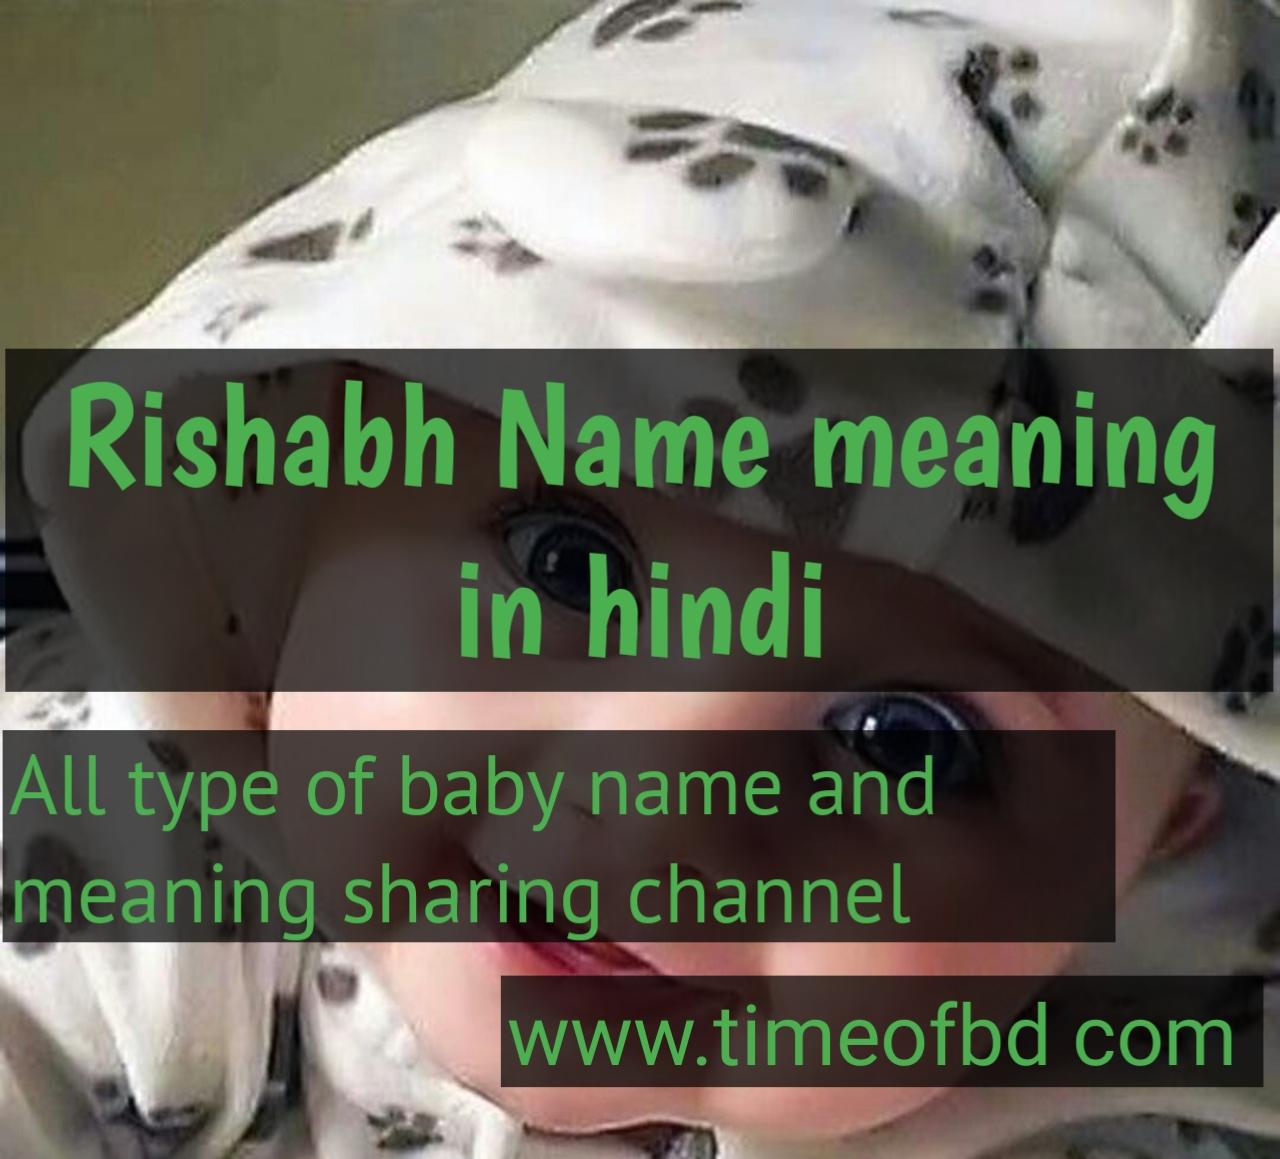 rishabh name meaning in hindi, rishabh ka meaning ,rishabh meaning in hindi dictioanry,meaning of rishabh  in hindi